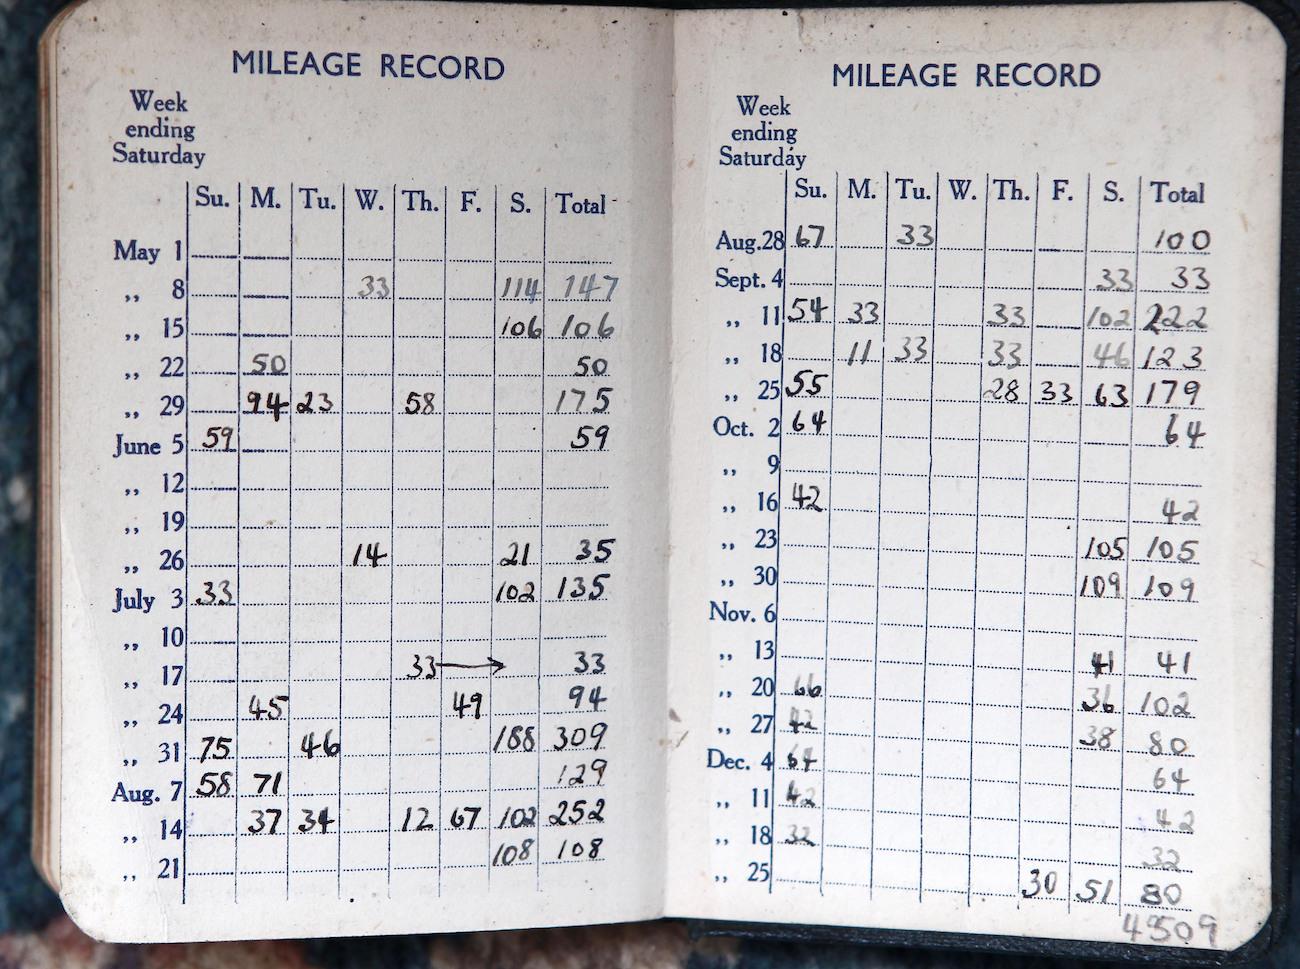 Mileage Spreadsheet For Taxes Spreadshee Mileage